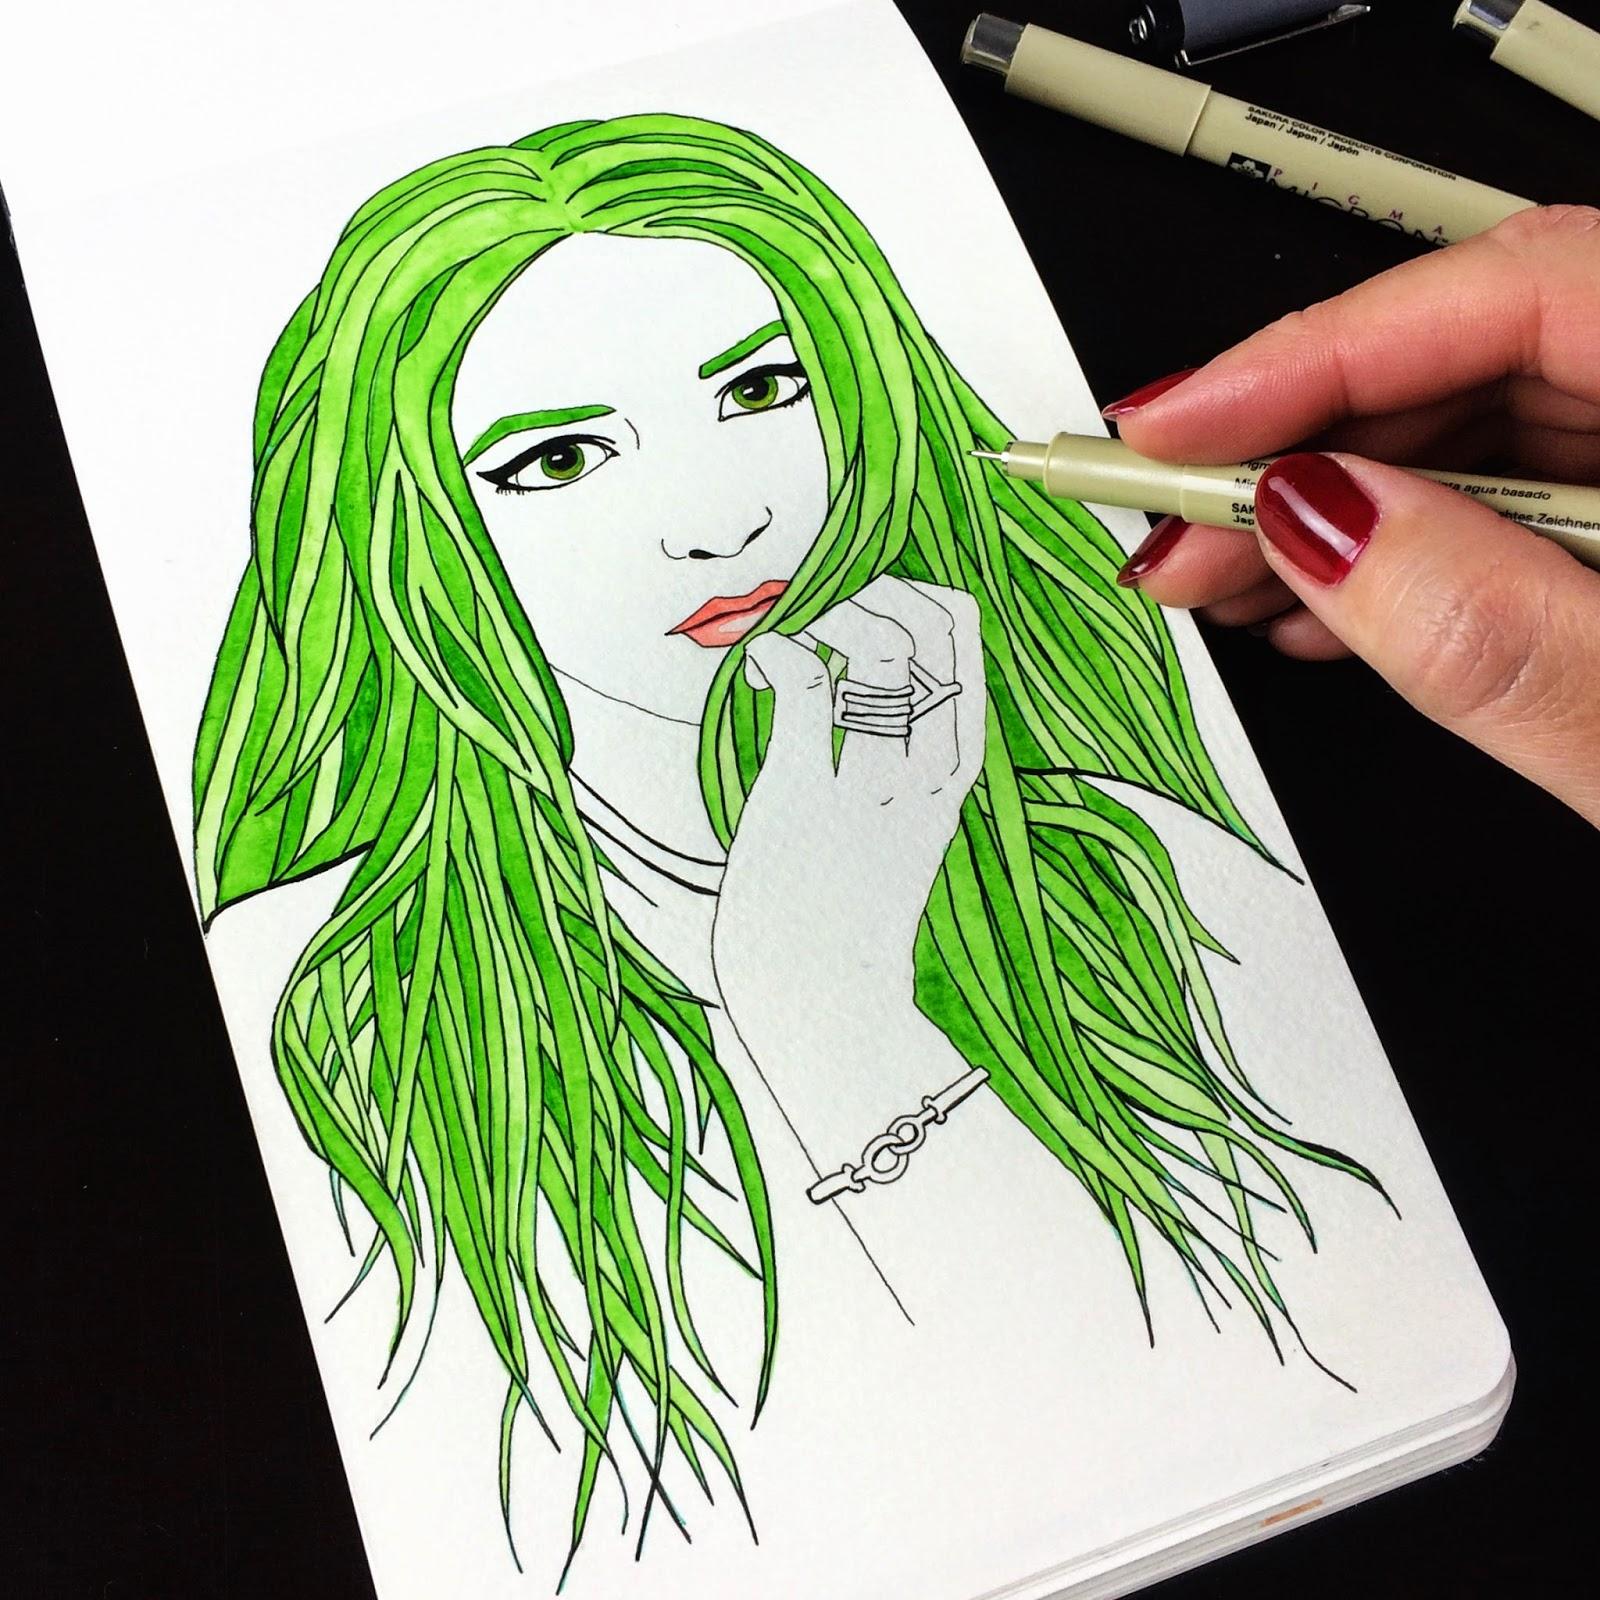 Inktober fashion illustration of Kristina Bazan by Jessica Mack aka BrownPaperBunny